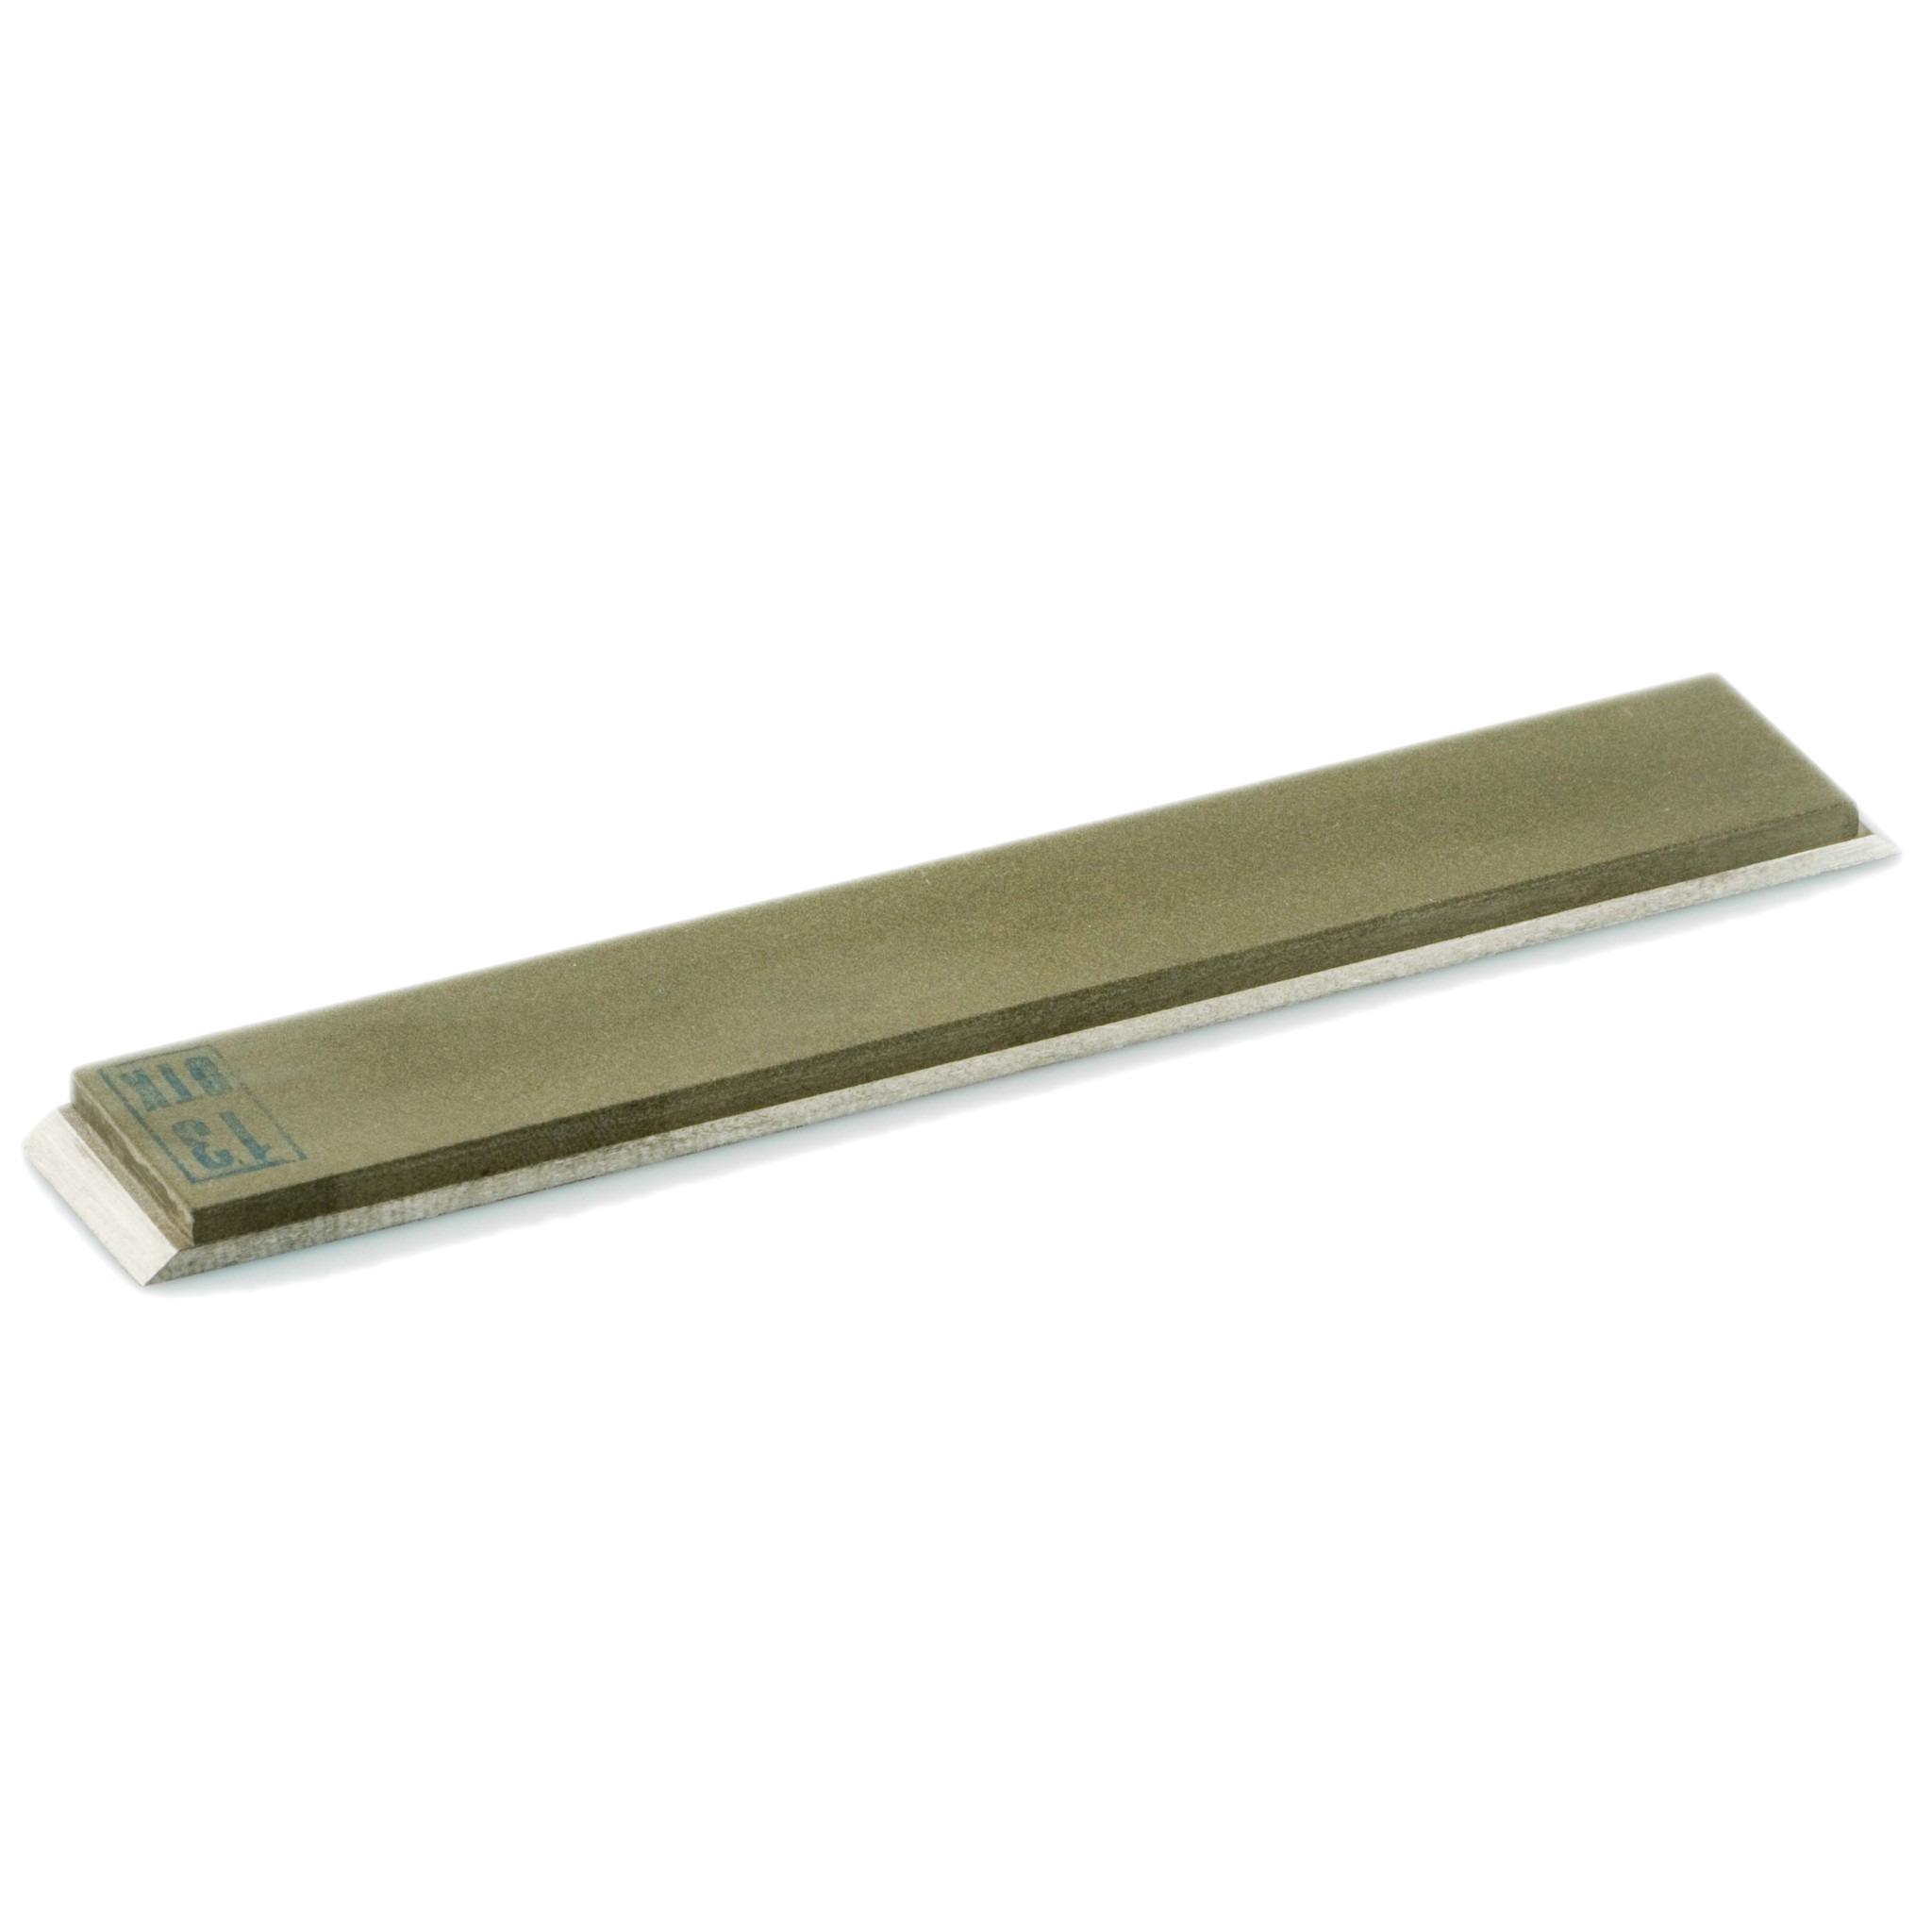 150х25х6 мм для Apex Edge Pro, ЖУК Алмазный брусок 150х25х6 40/28 100% Белый.jpg